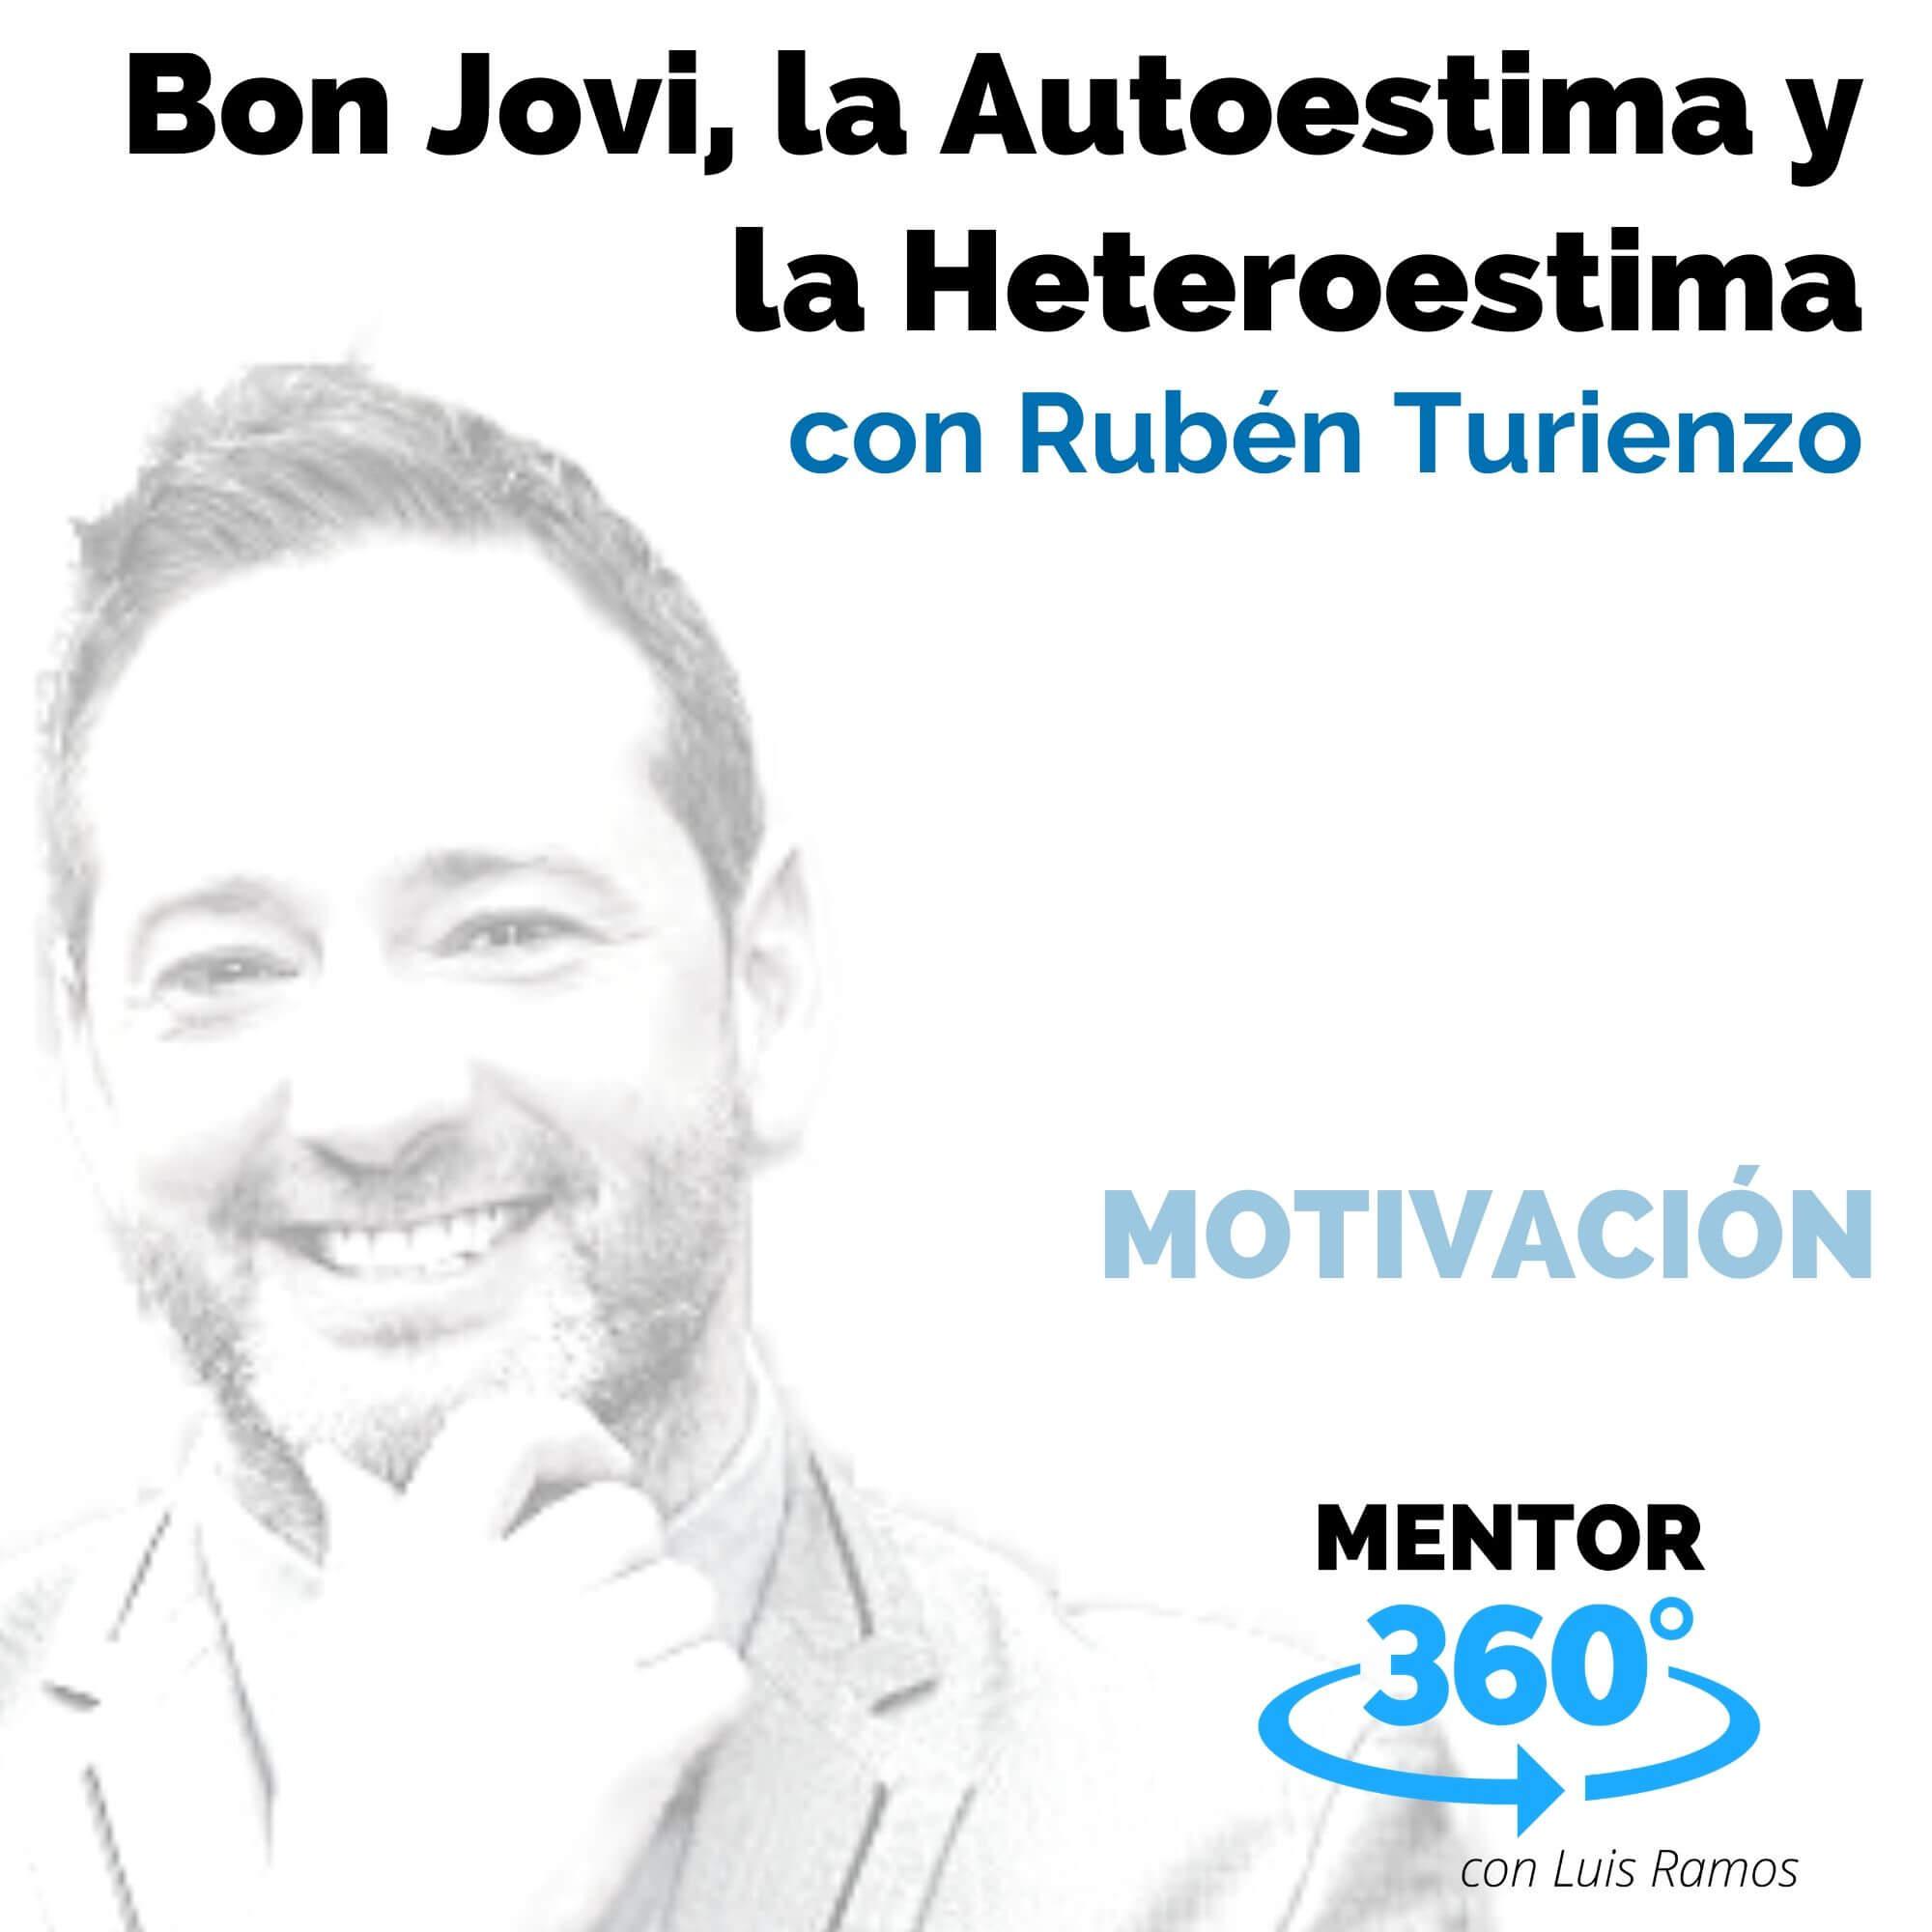 Bon Jovi, la Autoestima y la Heteroestima, con Rubén Turienzo - MENTOR360